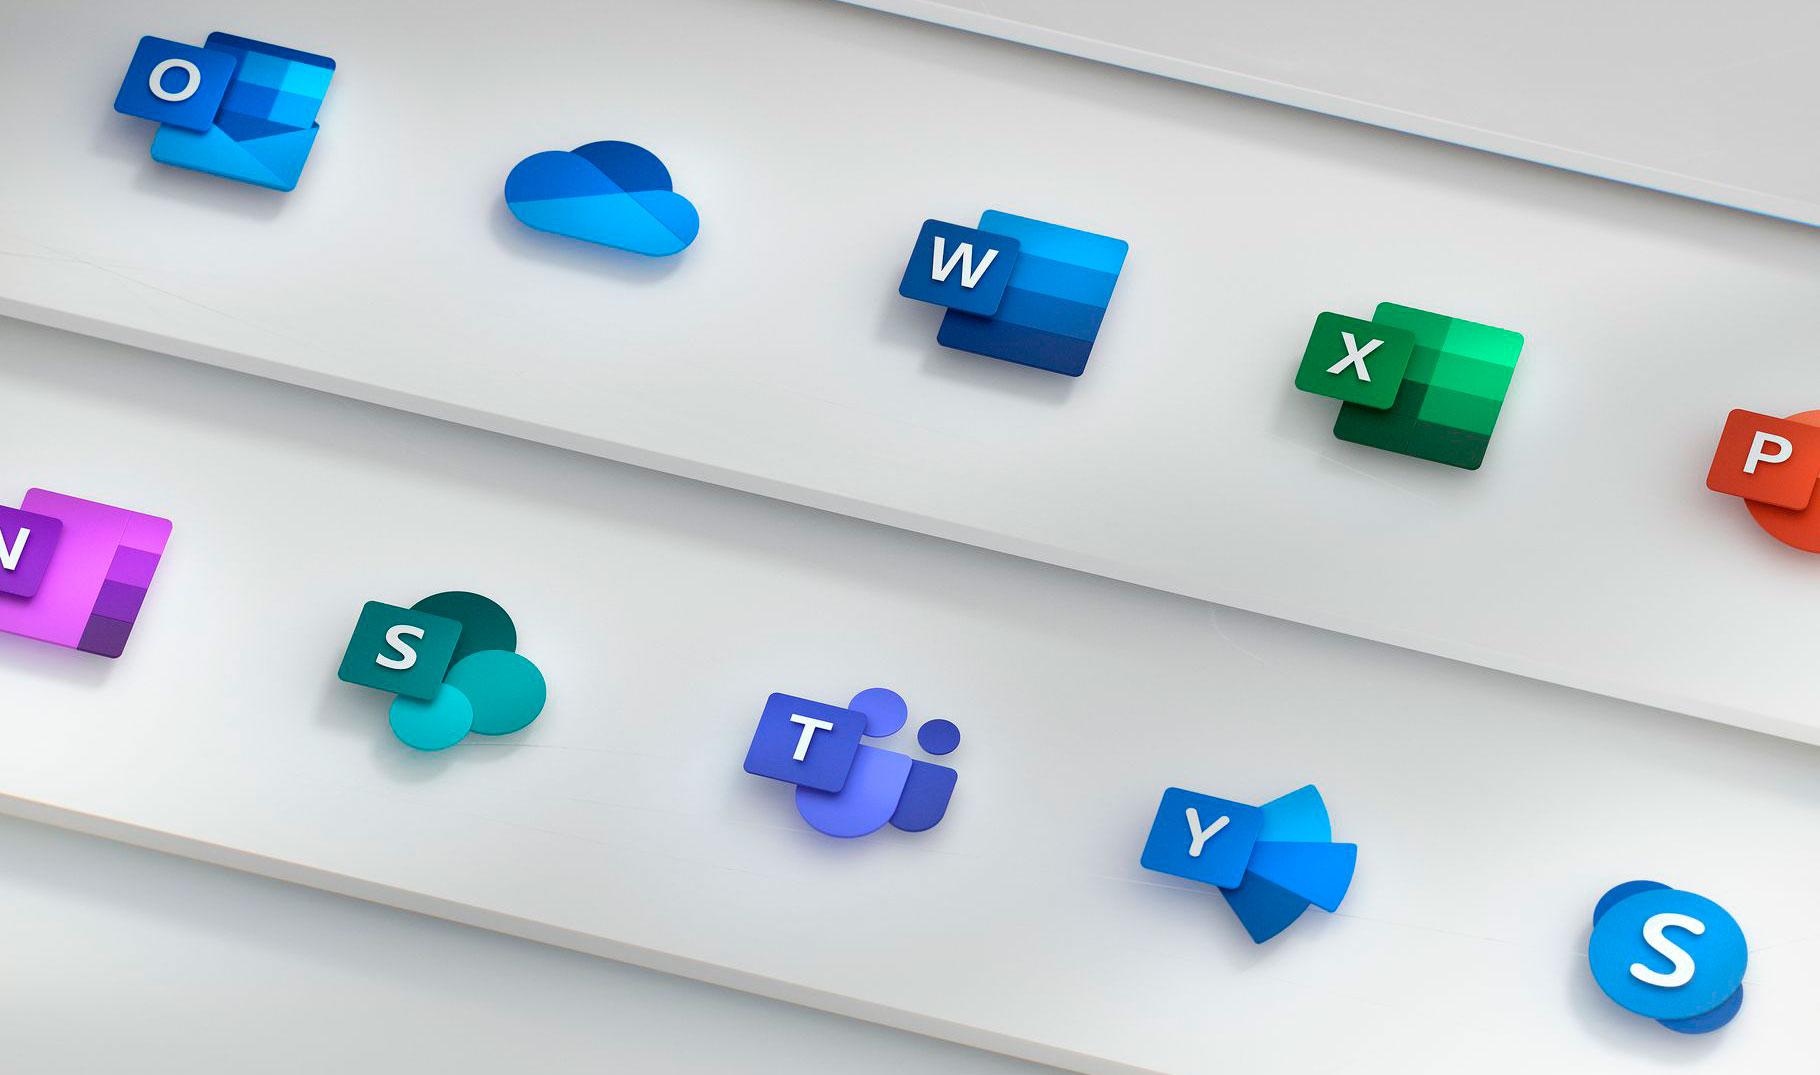 https://www.macfreak.nl/modules/news/images/zArt.MicrosoftOfficeIcons.jpg